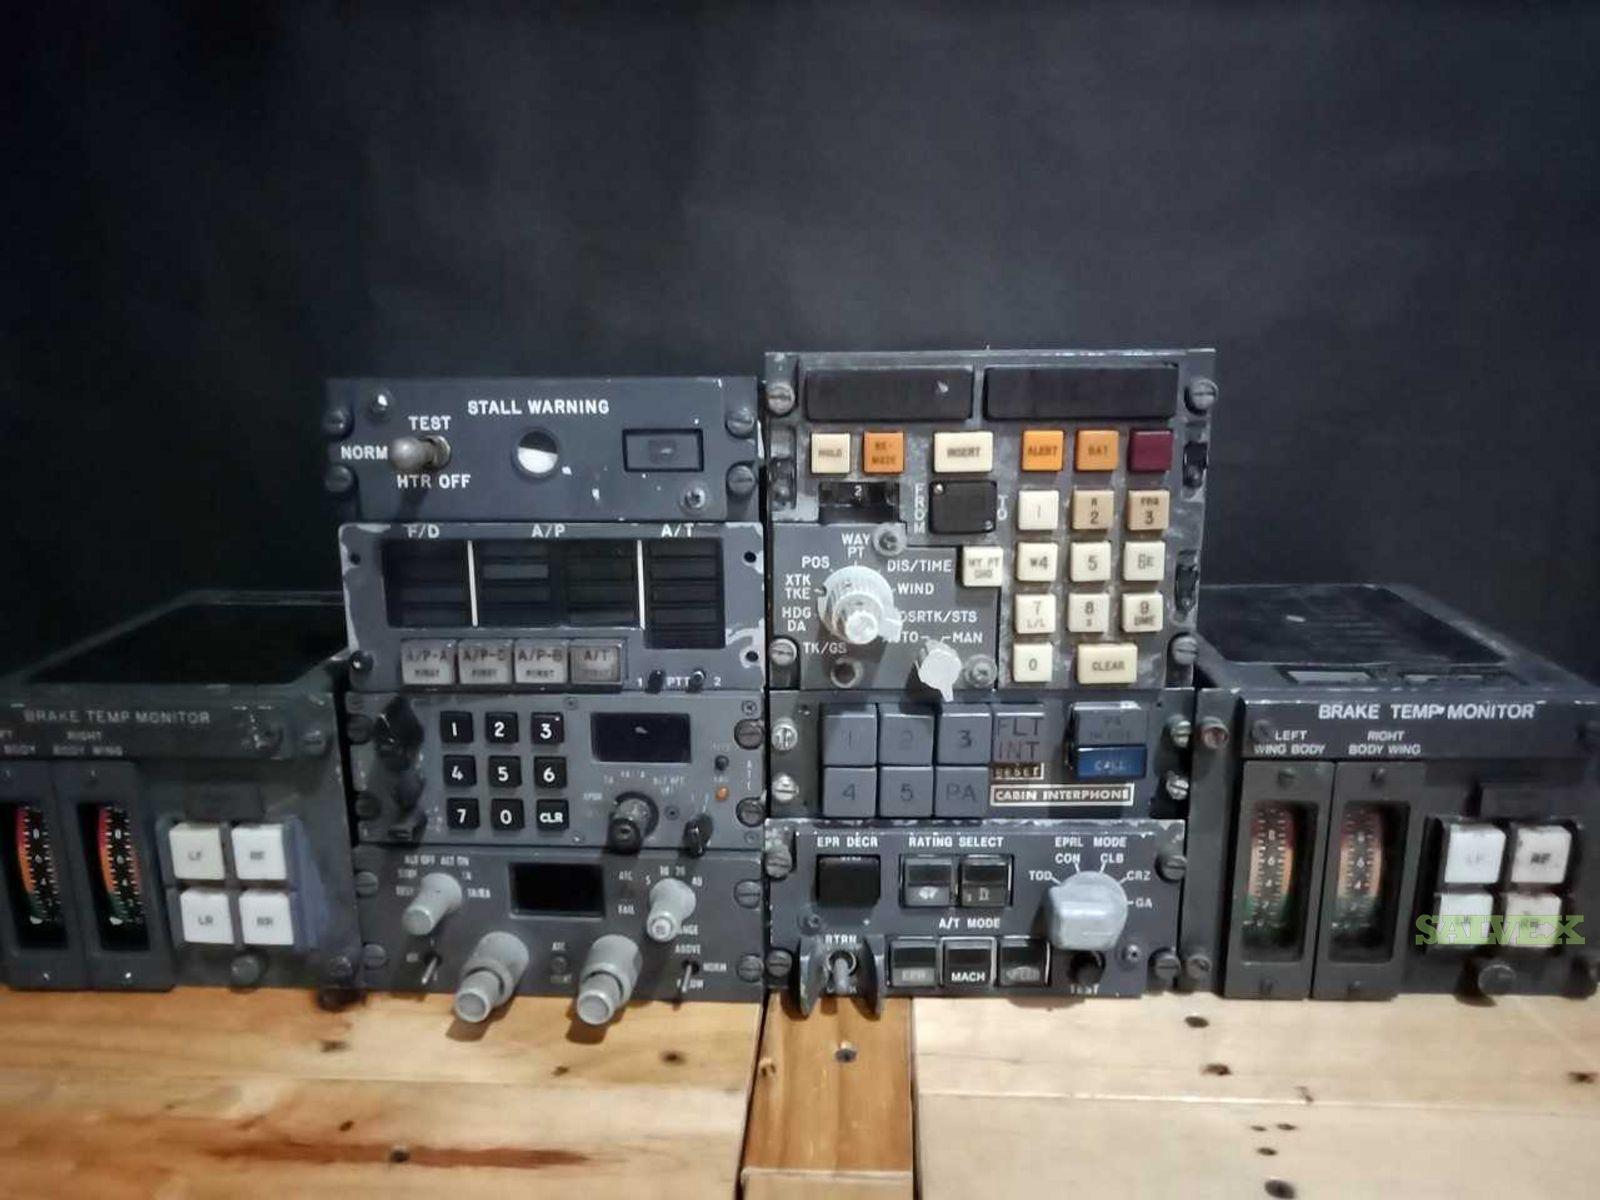 TCAS Control Panel , CDU, Brake Temp Monitors  (9 Units)